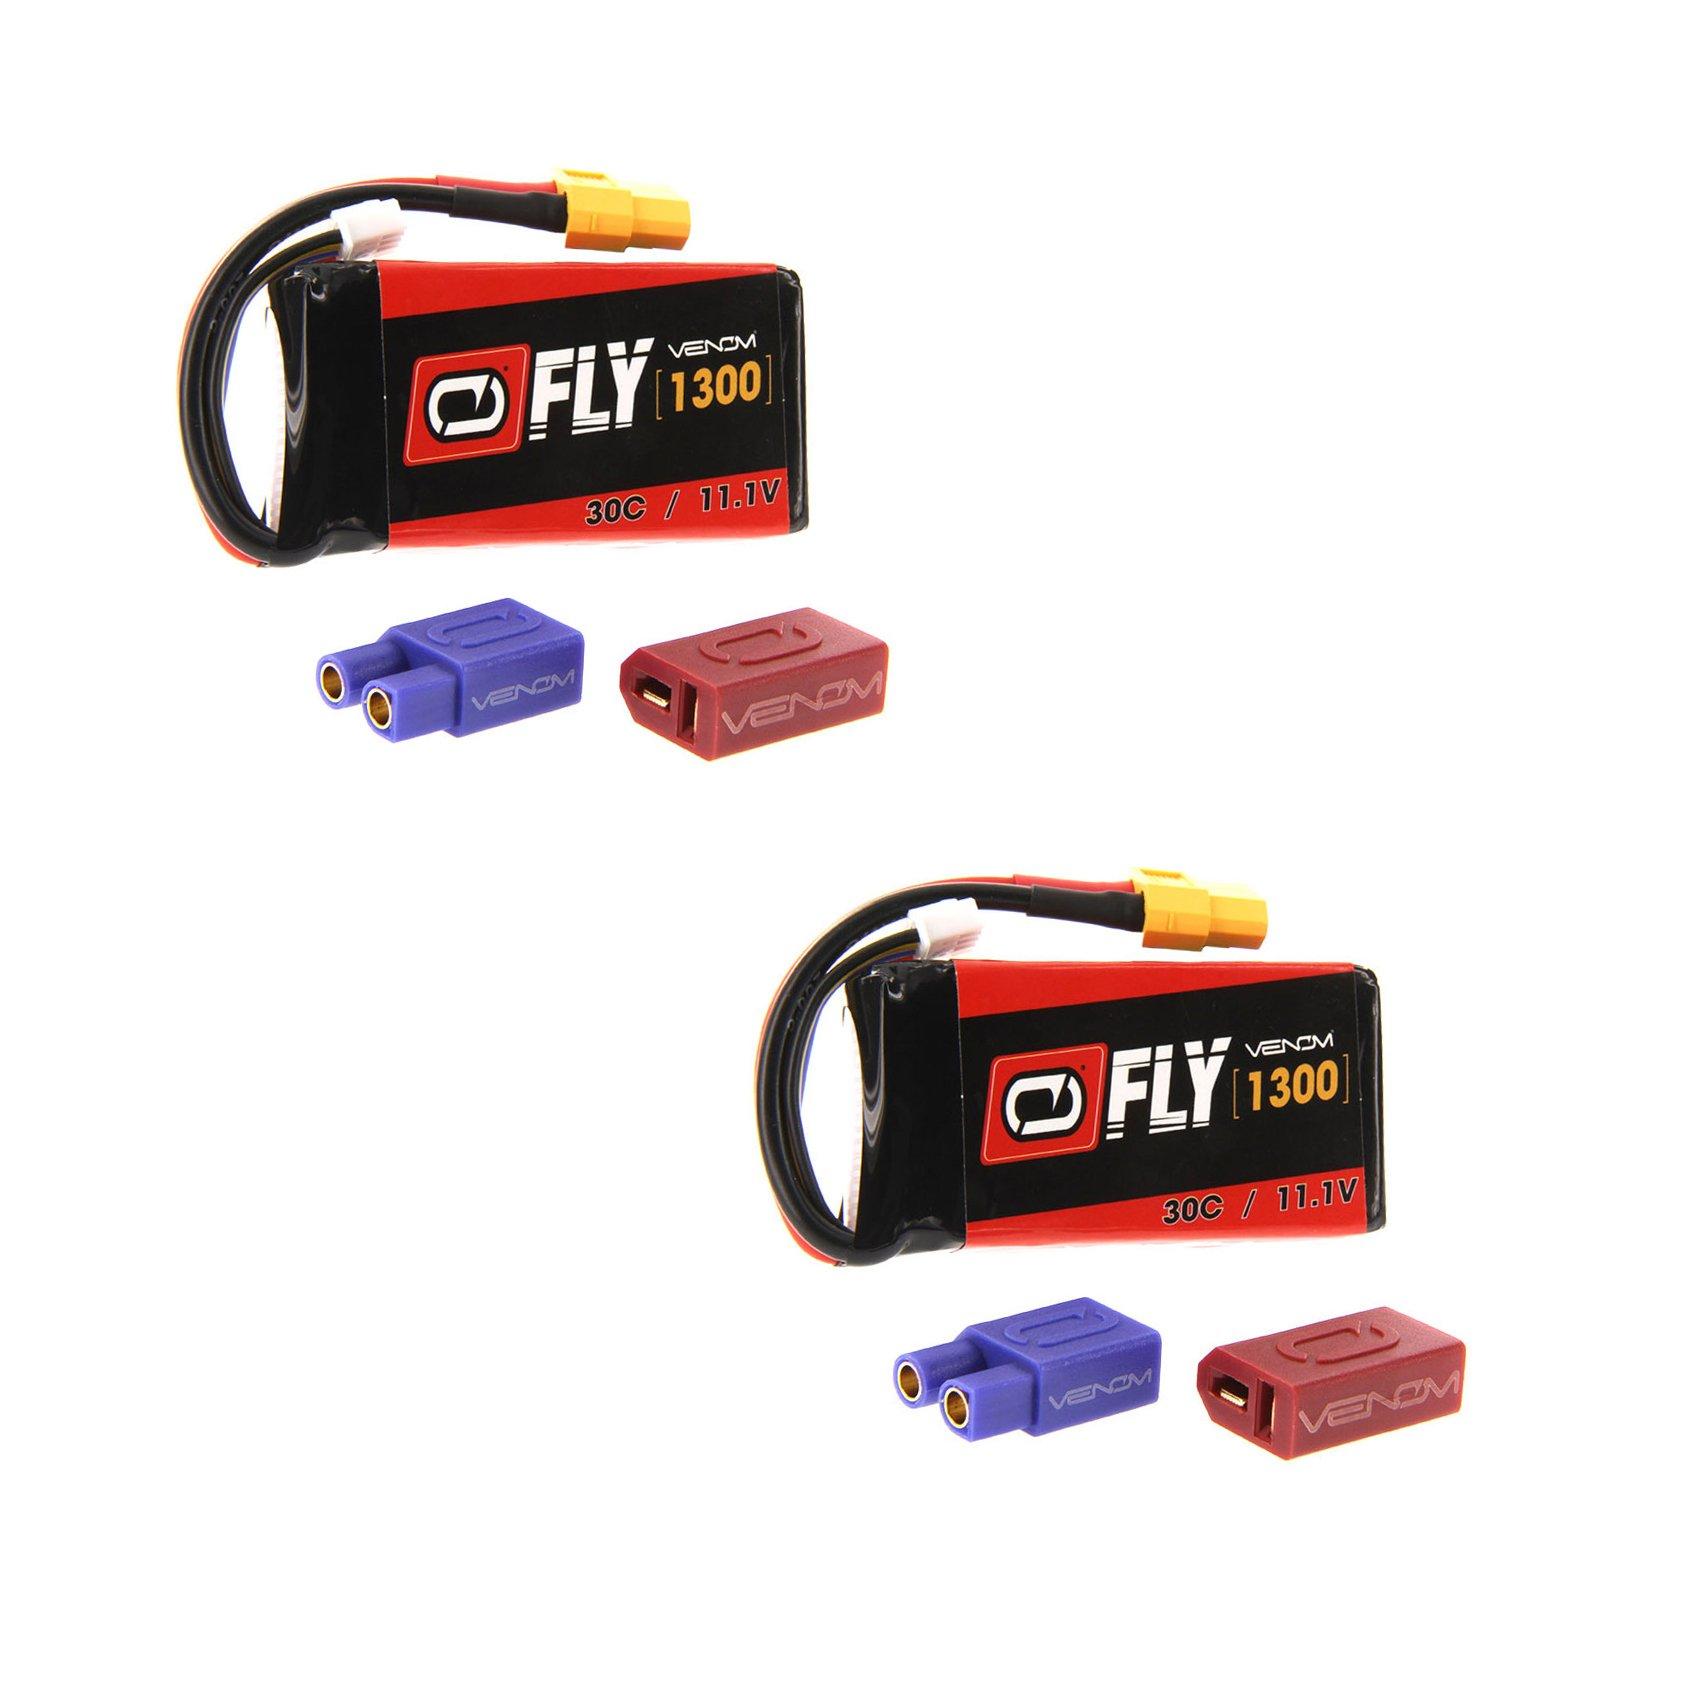 Venom Fly 30C 3S 1300mAh 11.1V LiPo Battery with UNI 2.0 Plug (XT60/Deans/EC3) x2 Packs Compare to E-flite EFLB13003S20